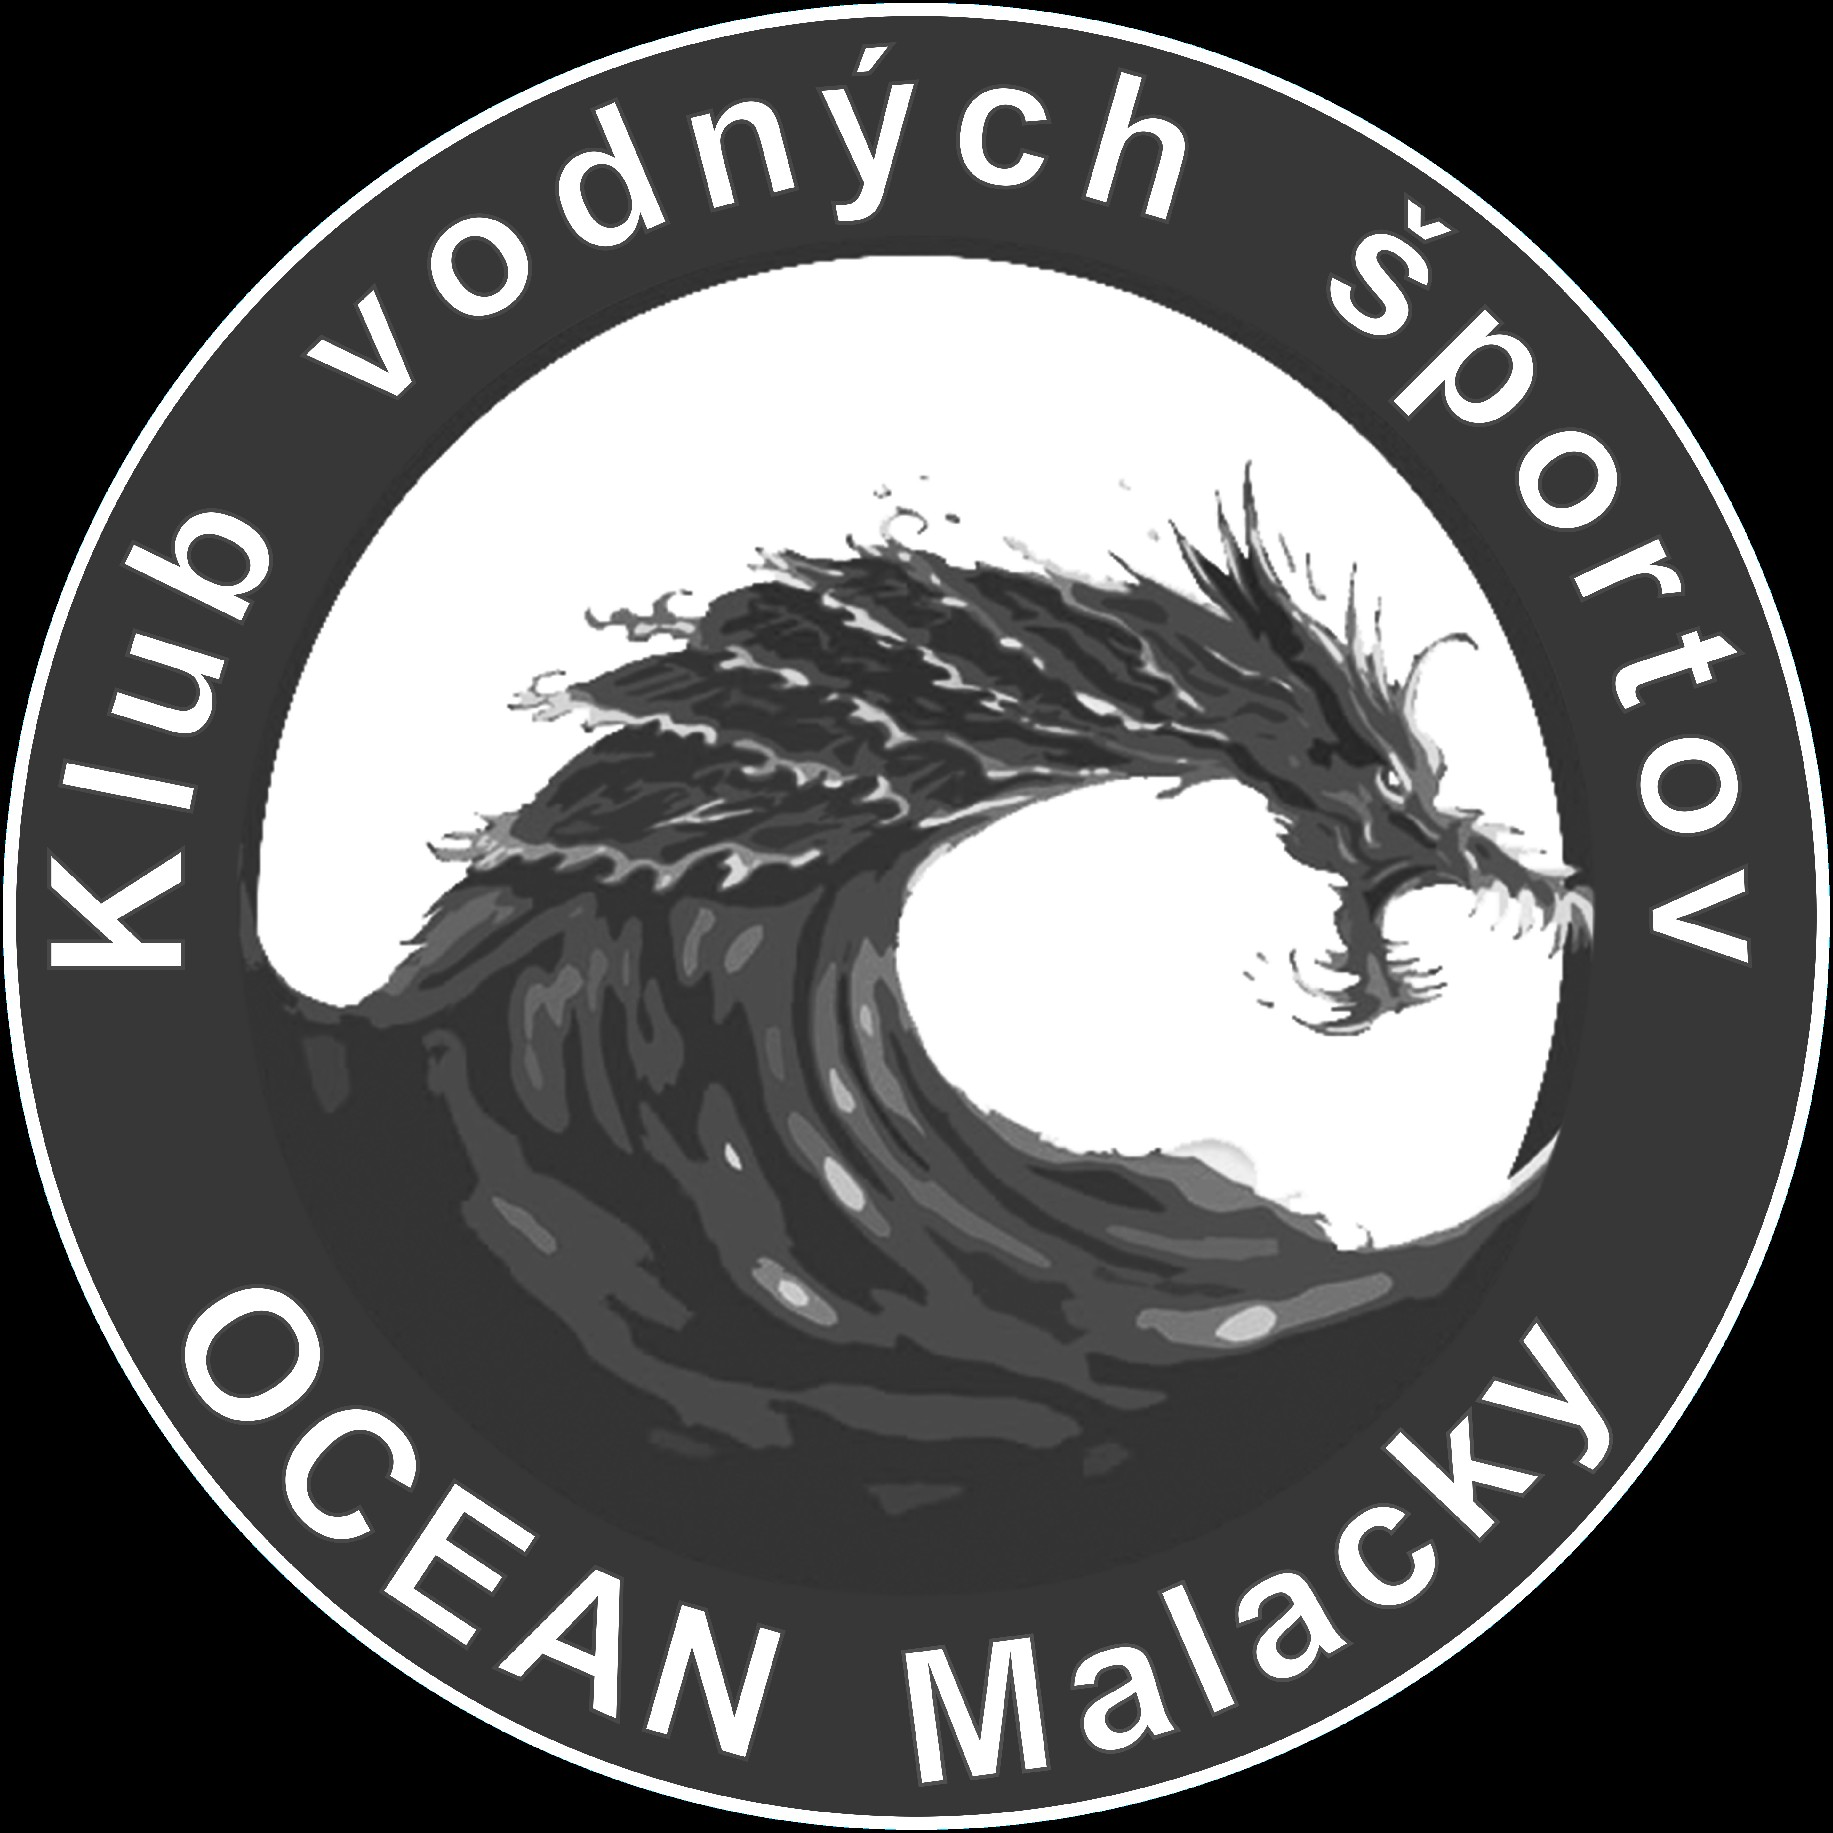 http://plavaniemalacky.sk/wp-content/uploads/2018/02/logo-malacky-BW.jpg